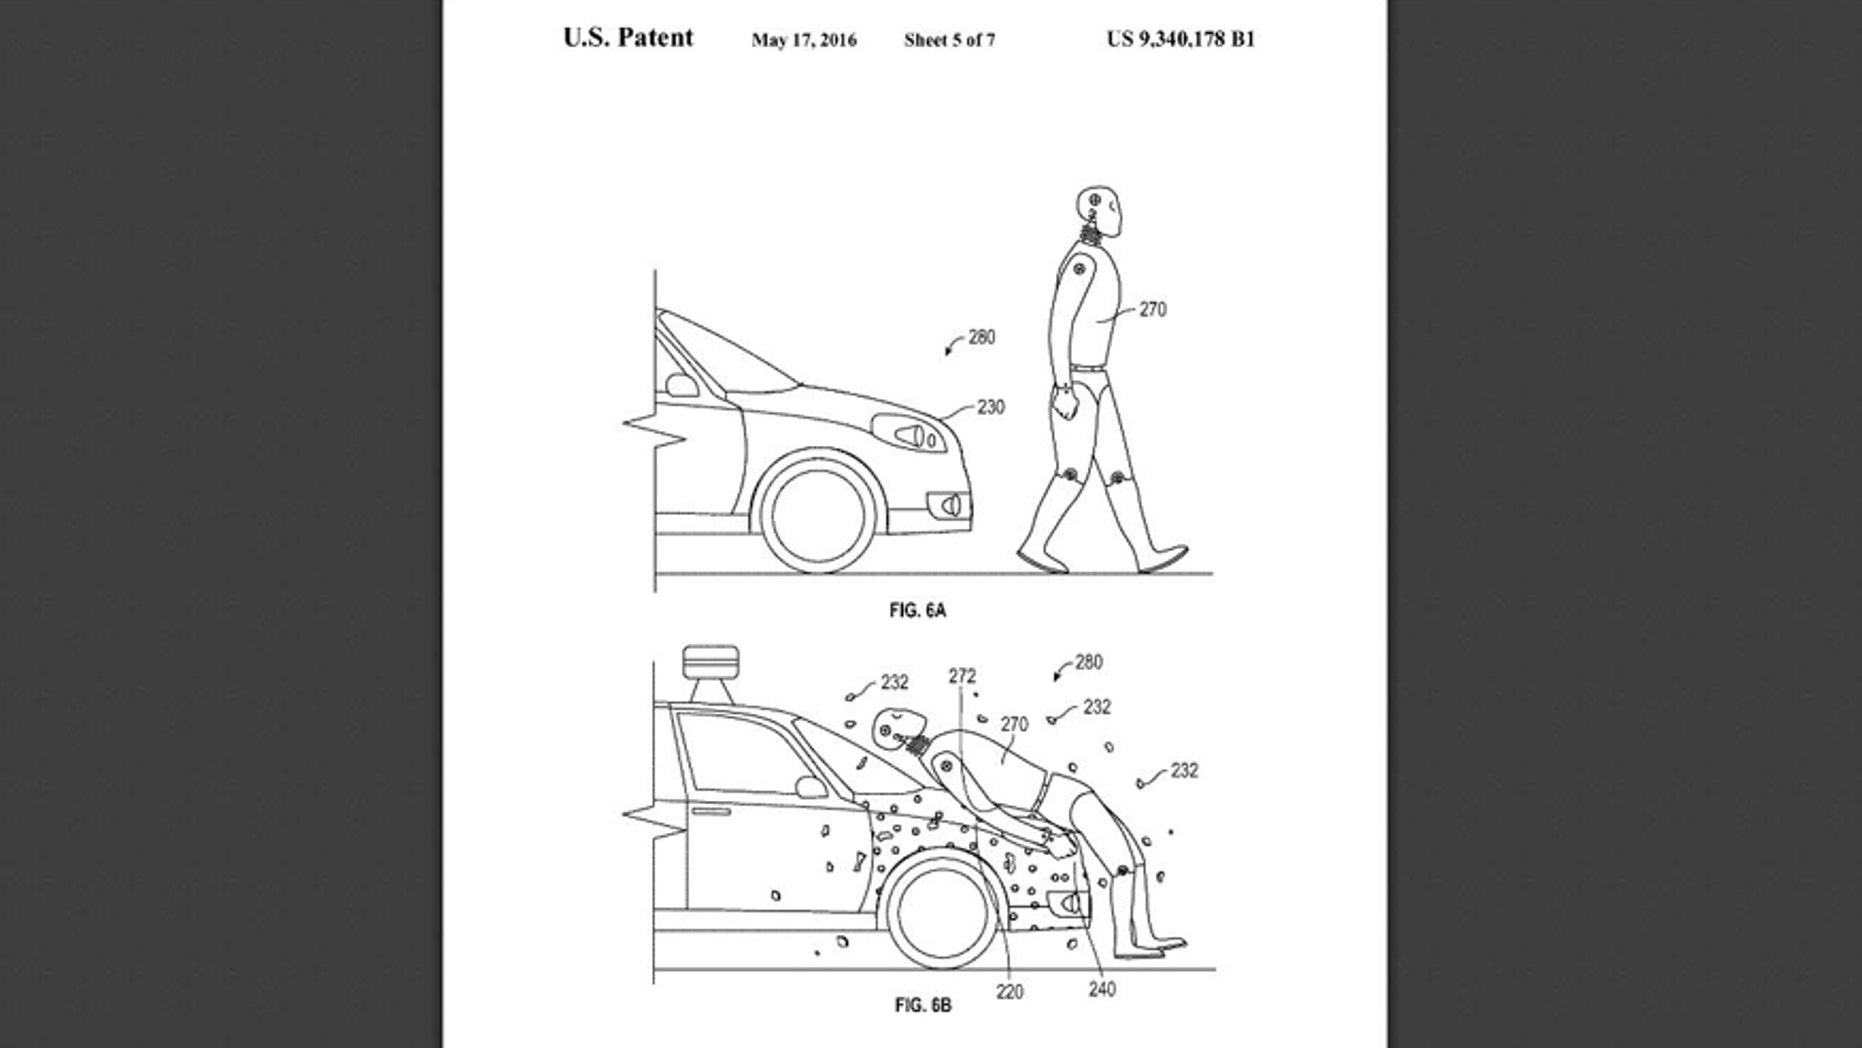 (Screenshot from Google's patent - www.uspto.gov)